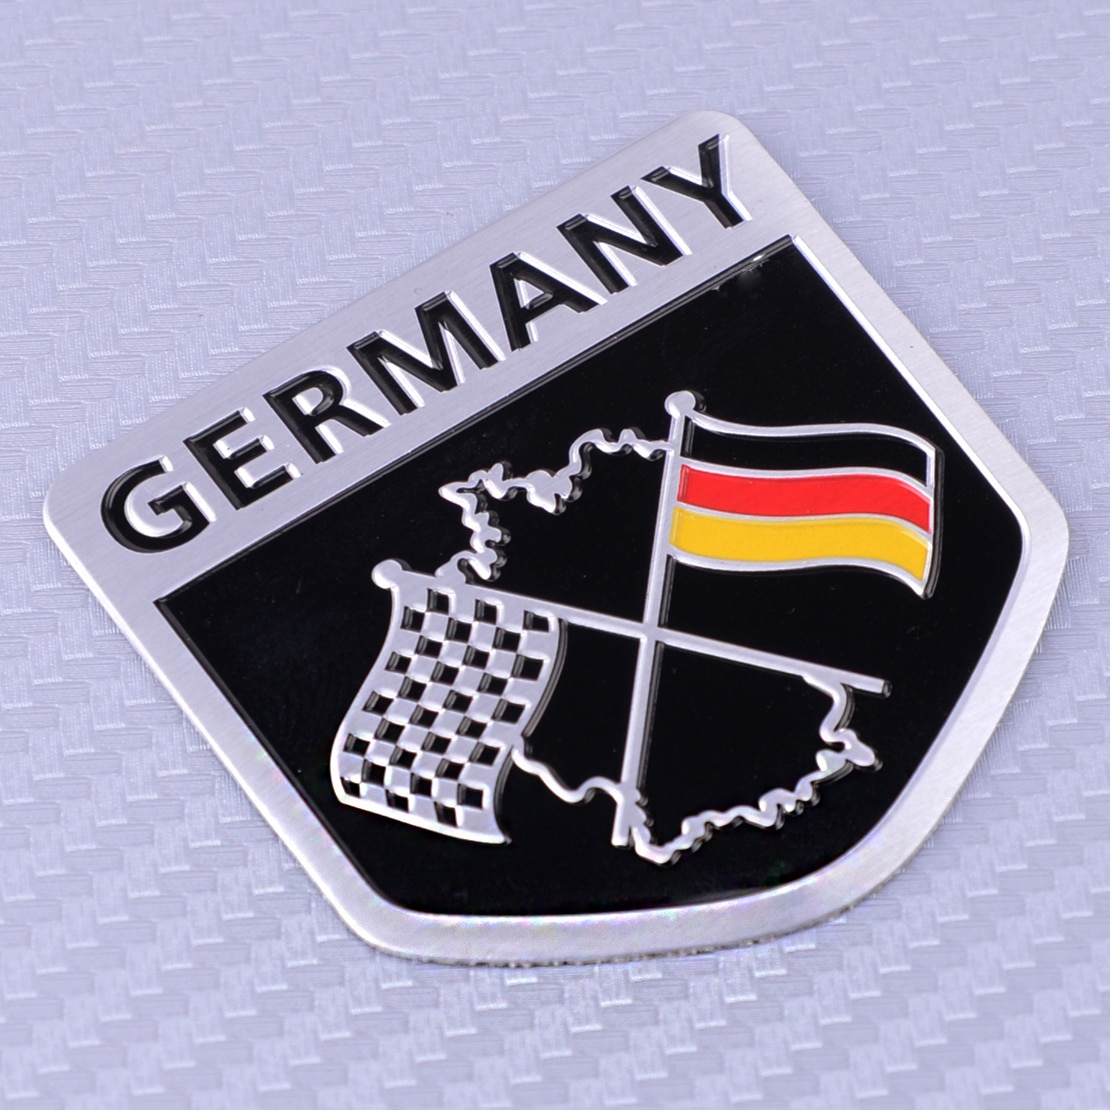 CITALL Aluminium Deutsch Auto Styling Racing Flagge Emblem Grille Badge Aufkleber Fit Für Porsche BMW VW Benz